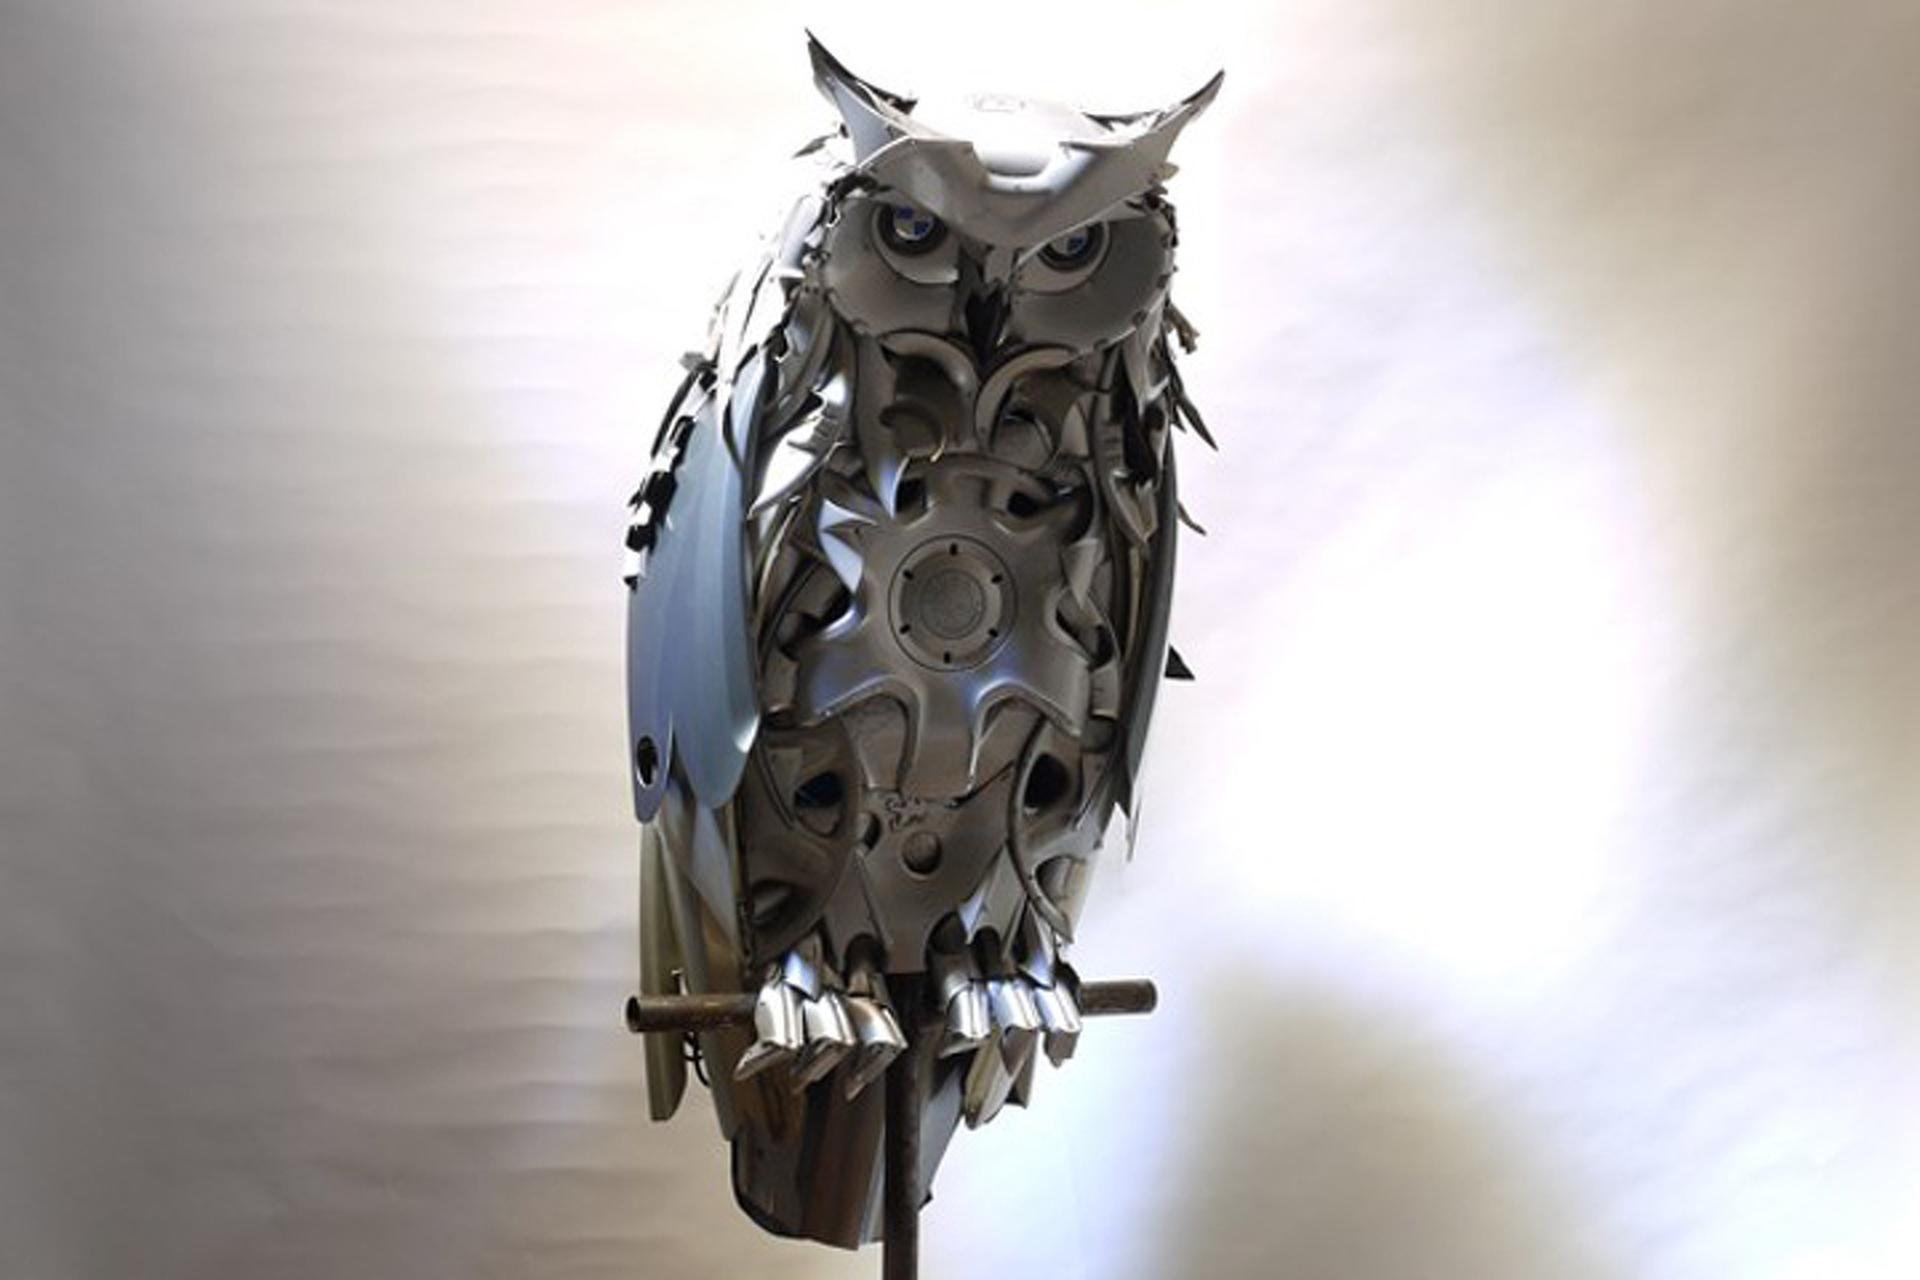 Artist Turns Hubcaps into Amazing Animal Sculptures